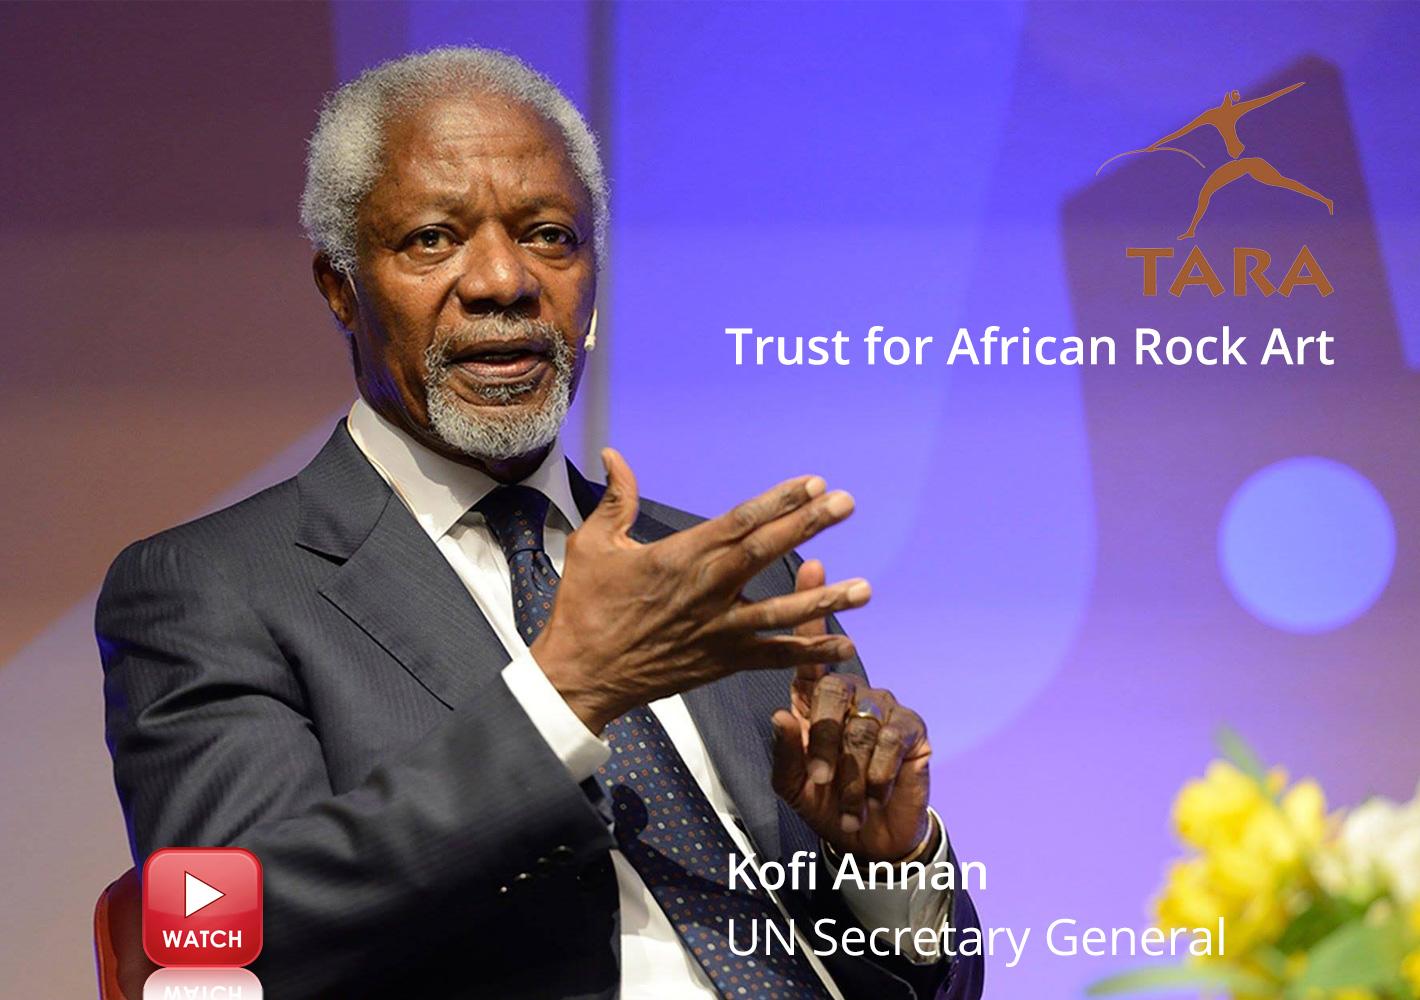 Kofi Annan, Africa, endangered rock art heritage, History of Rock Art, rock art techniques, David Coulson, carvings, Paintings